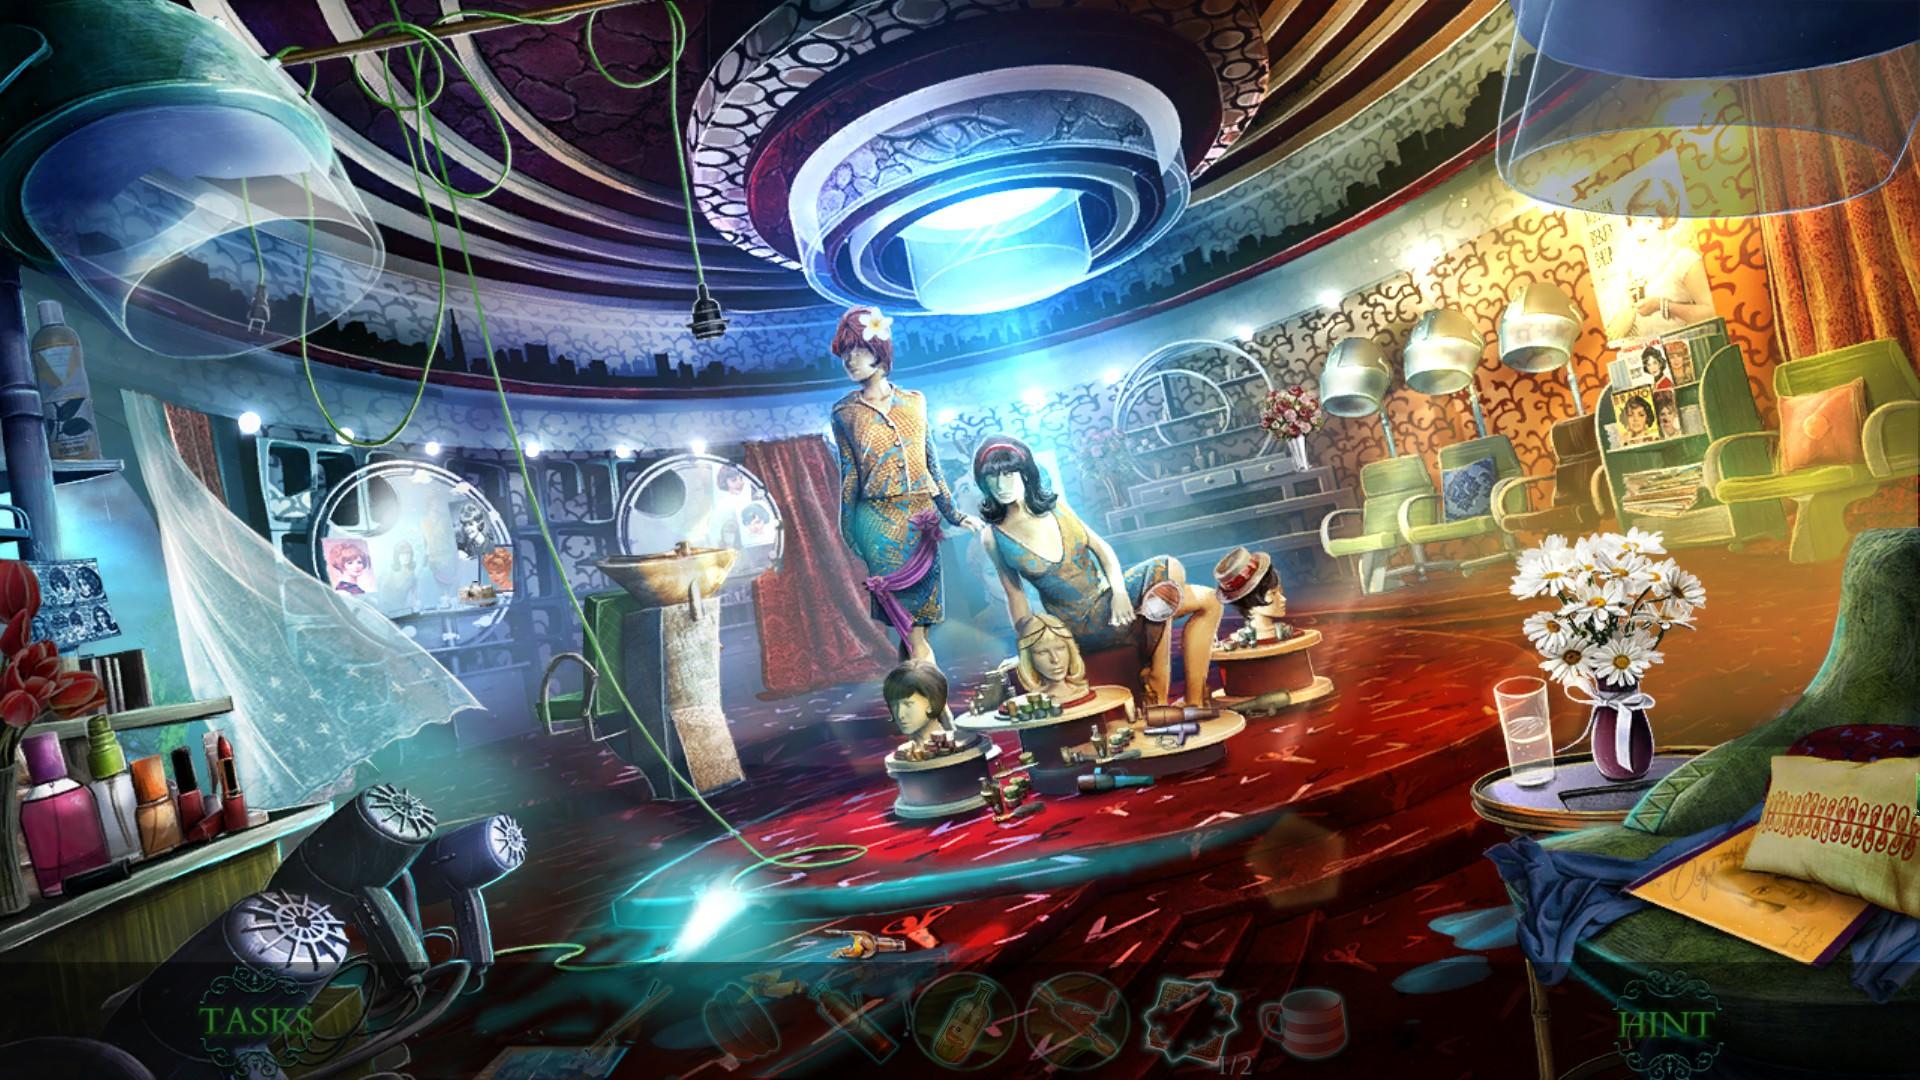 Phantasmat 3: The Endless Night BFBDB84598E1DD5B7C6E95B6D53538D1BC320457